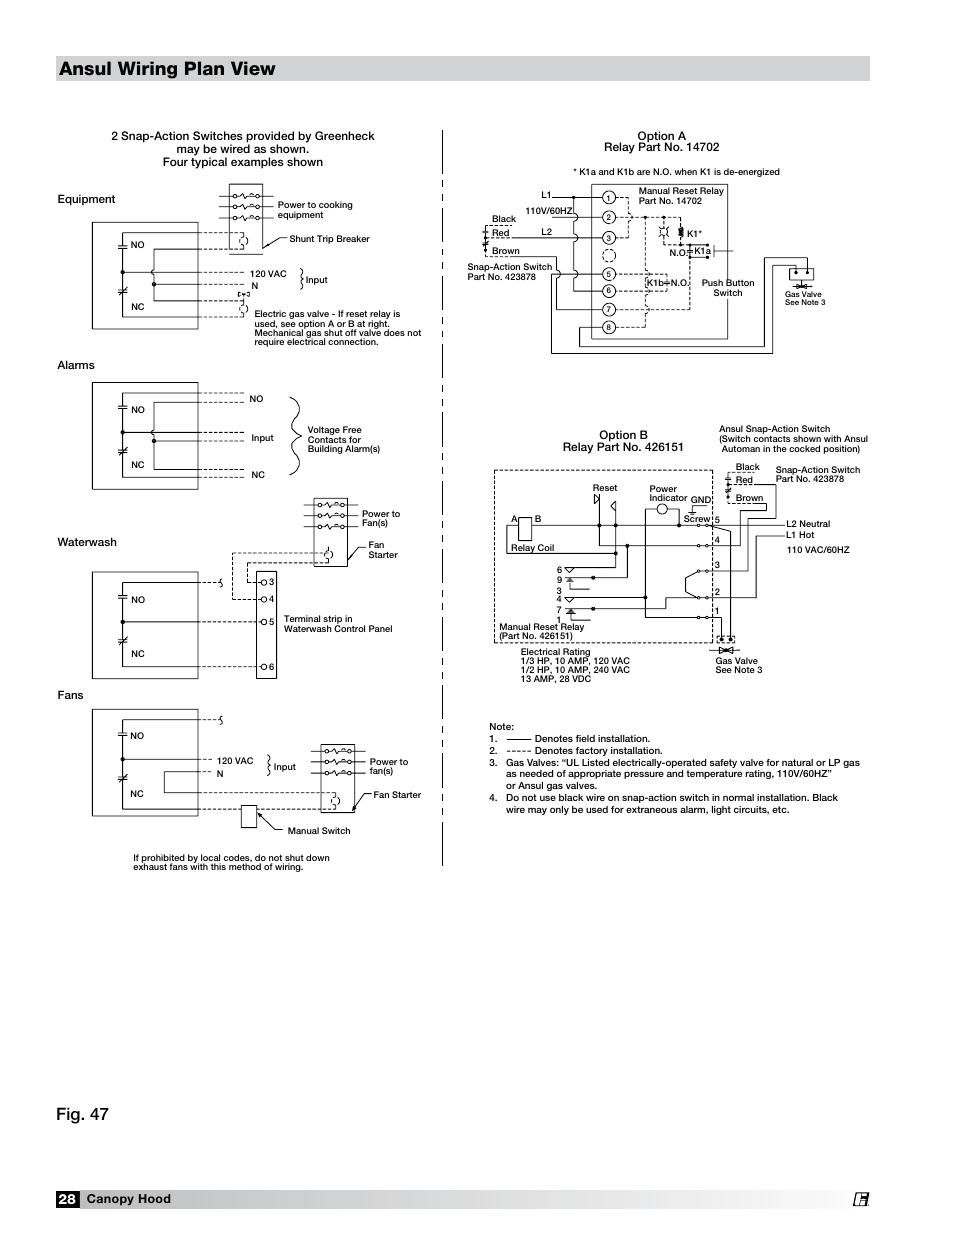 robertshaw 9615 thermostat wiring diagram wiring diagram perf ce robertshaw 9615 thermostat wiring schema wiring diagram robertshaw 9615 thermostat wiring diagram